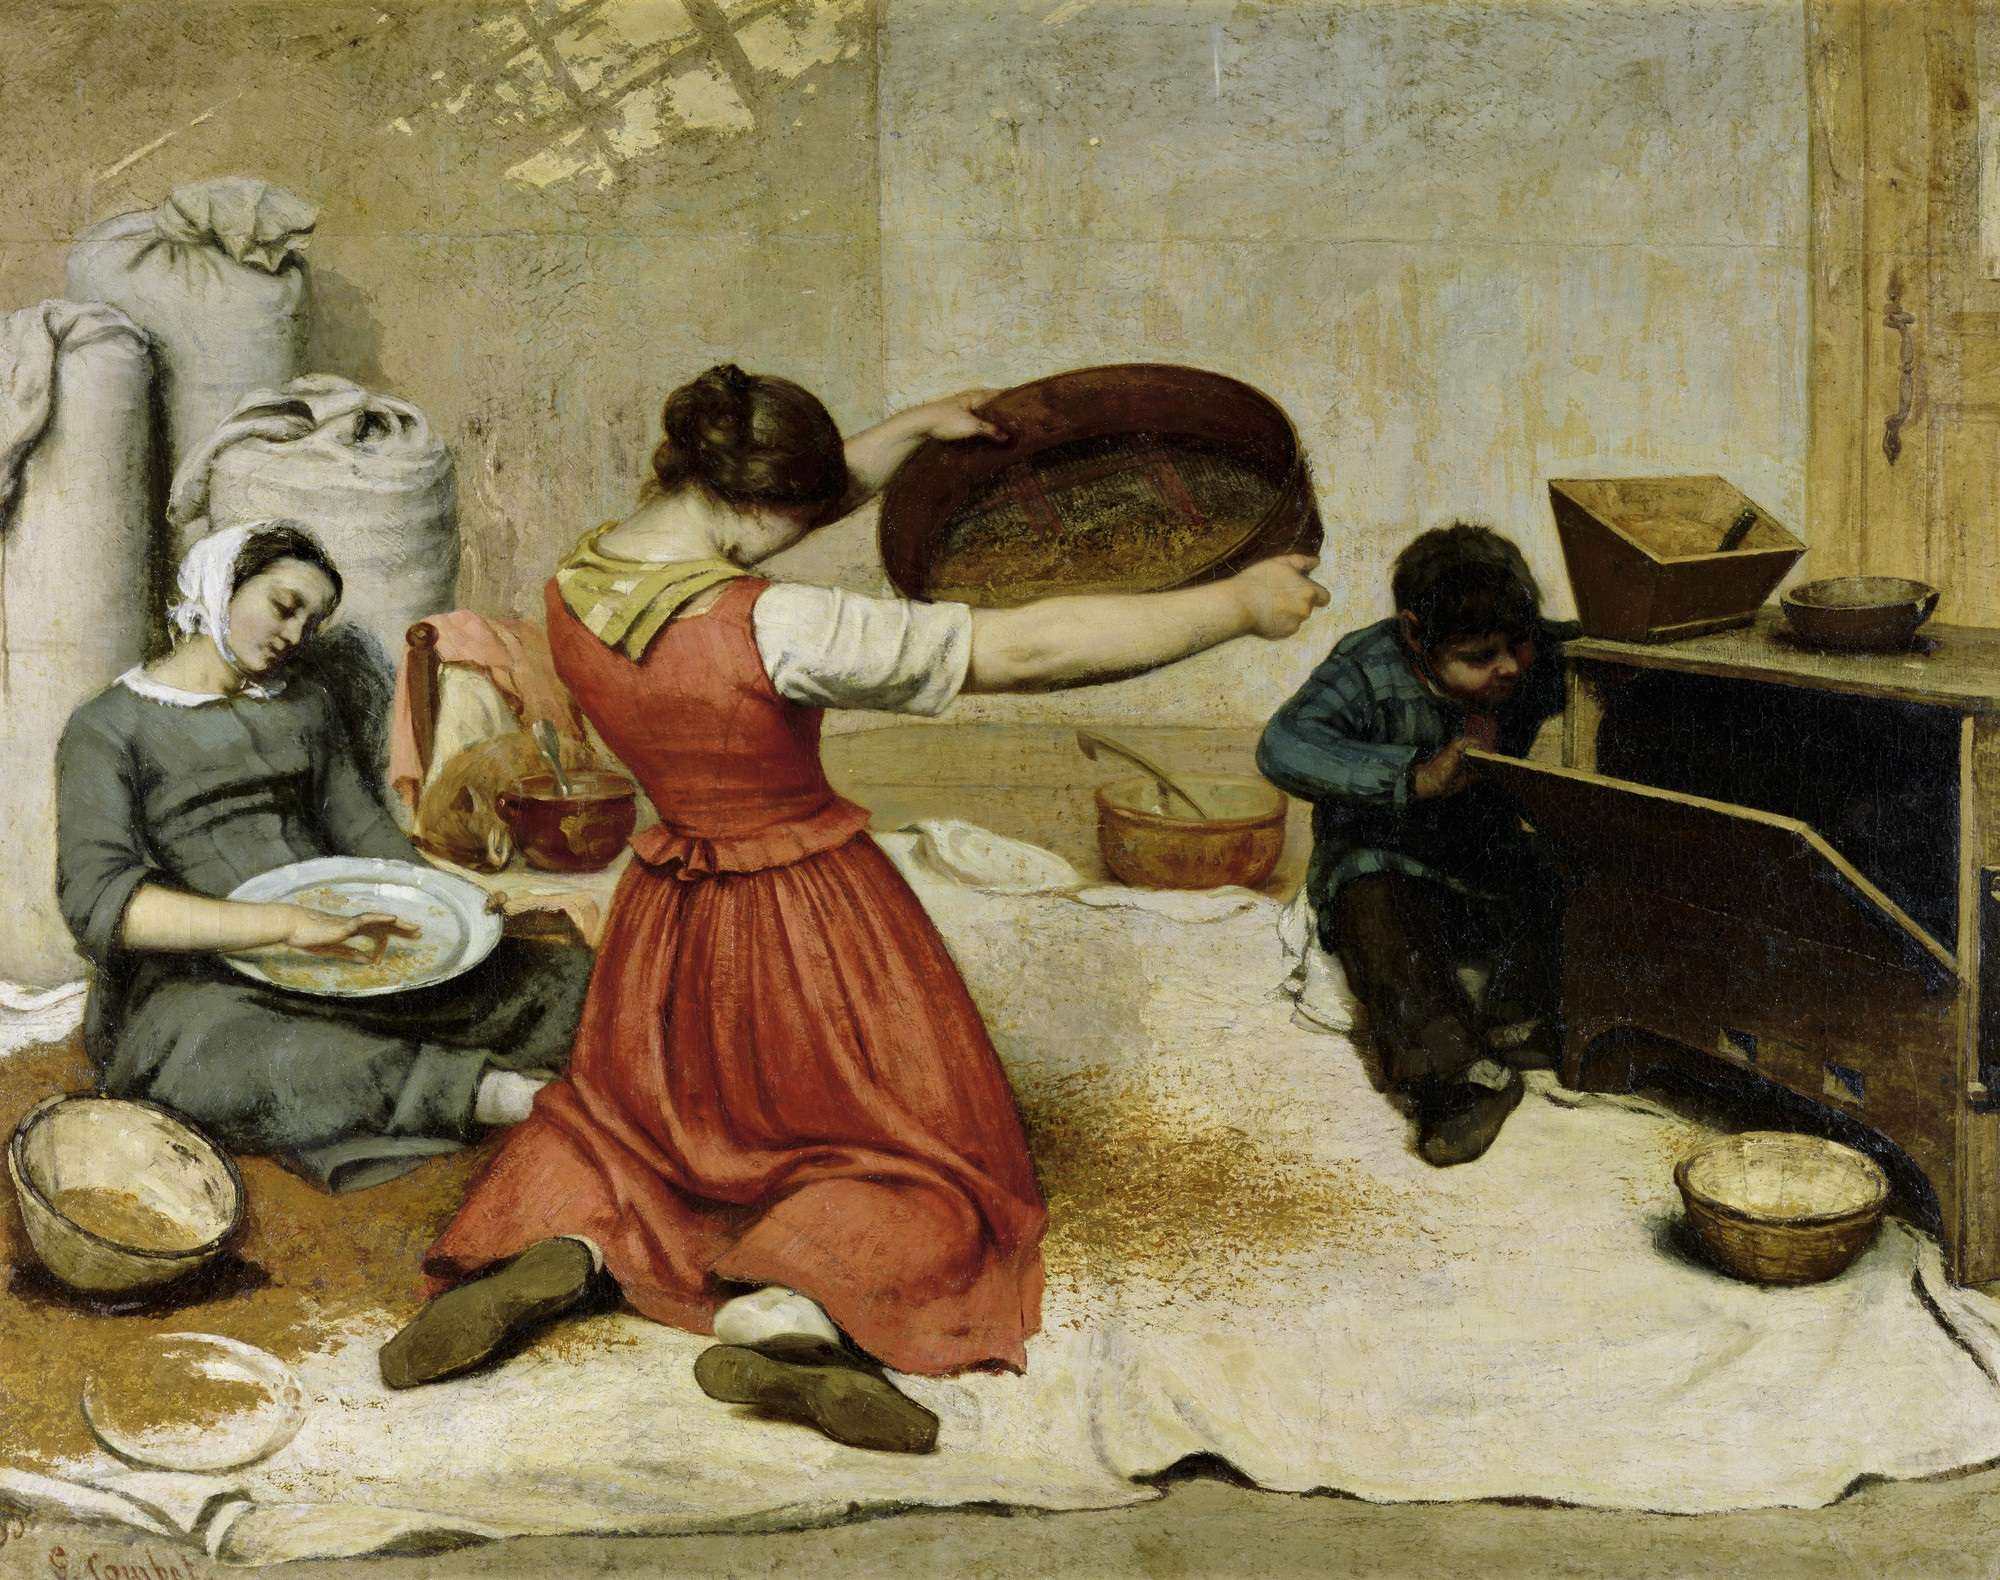 Oι κοσκινίστρες του σιταριού (Νάντη, Μουσείο Καλών Τεχνών),1854. Γκυστάβ Κουρμπέ (γαλ. Jean Désiré Gustave Courbet, 10 Ιουνίου 1819 - 31 Δεκεμβρίου 1877).